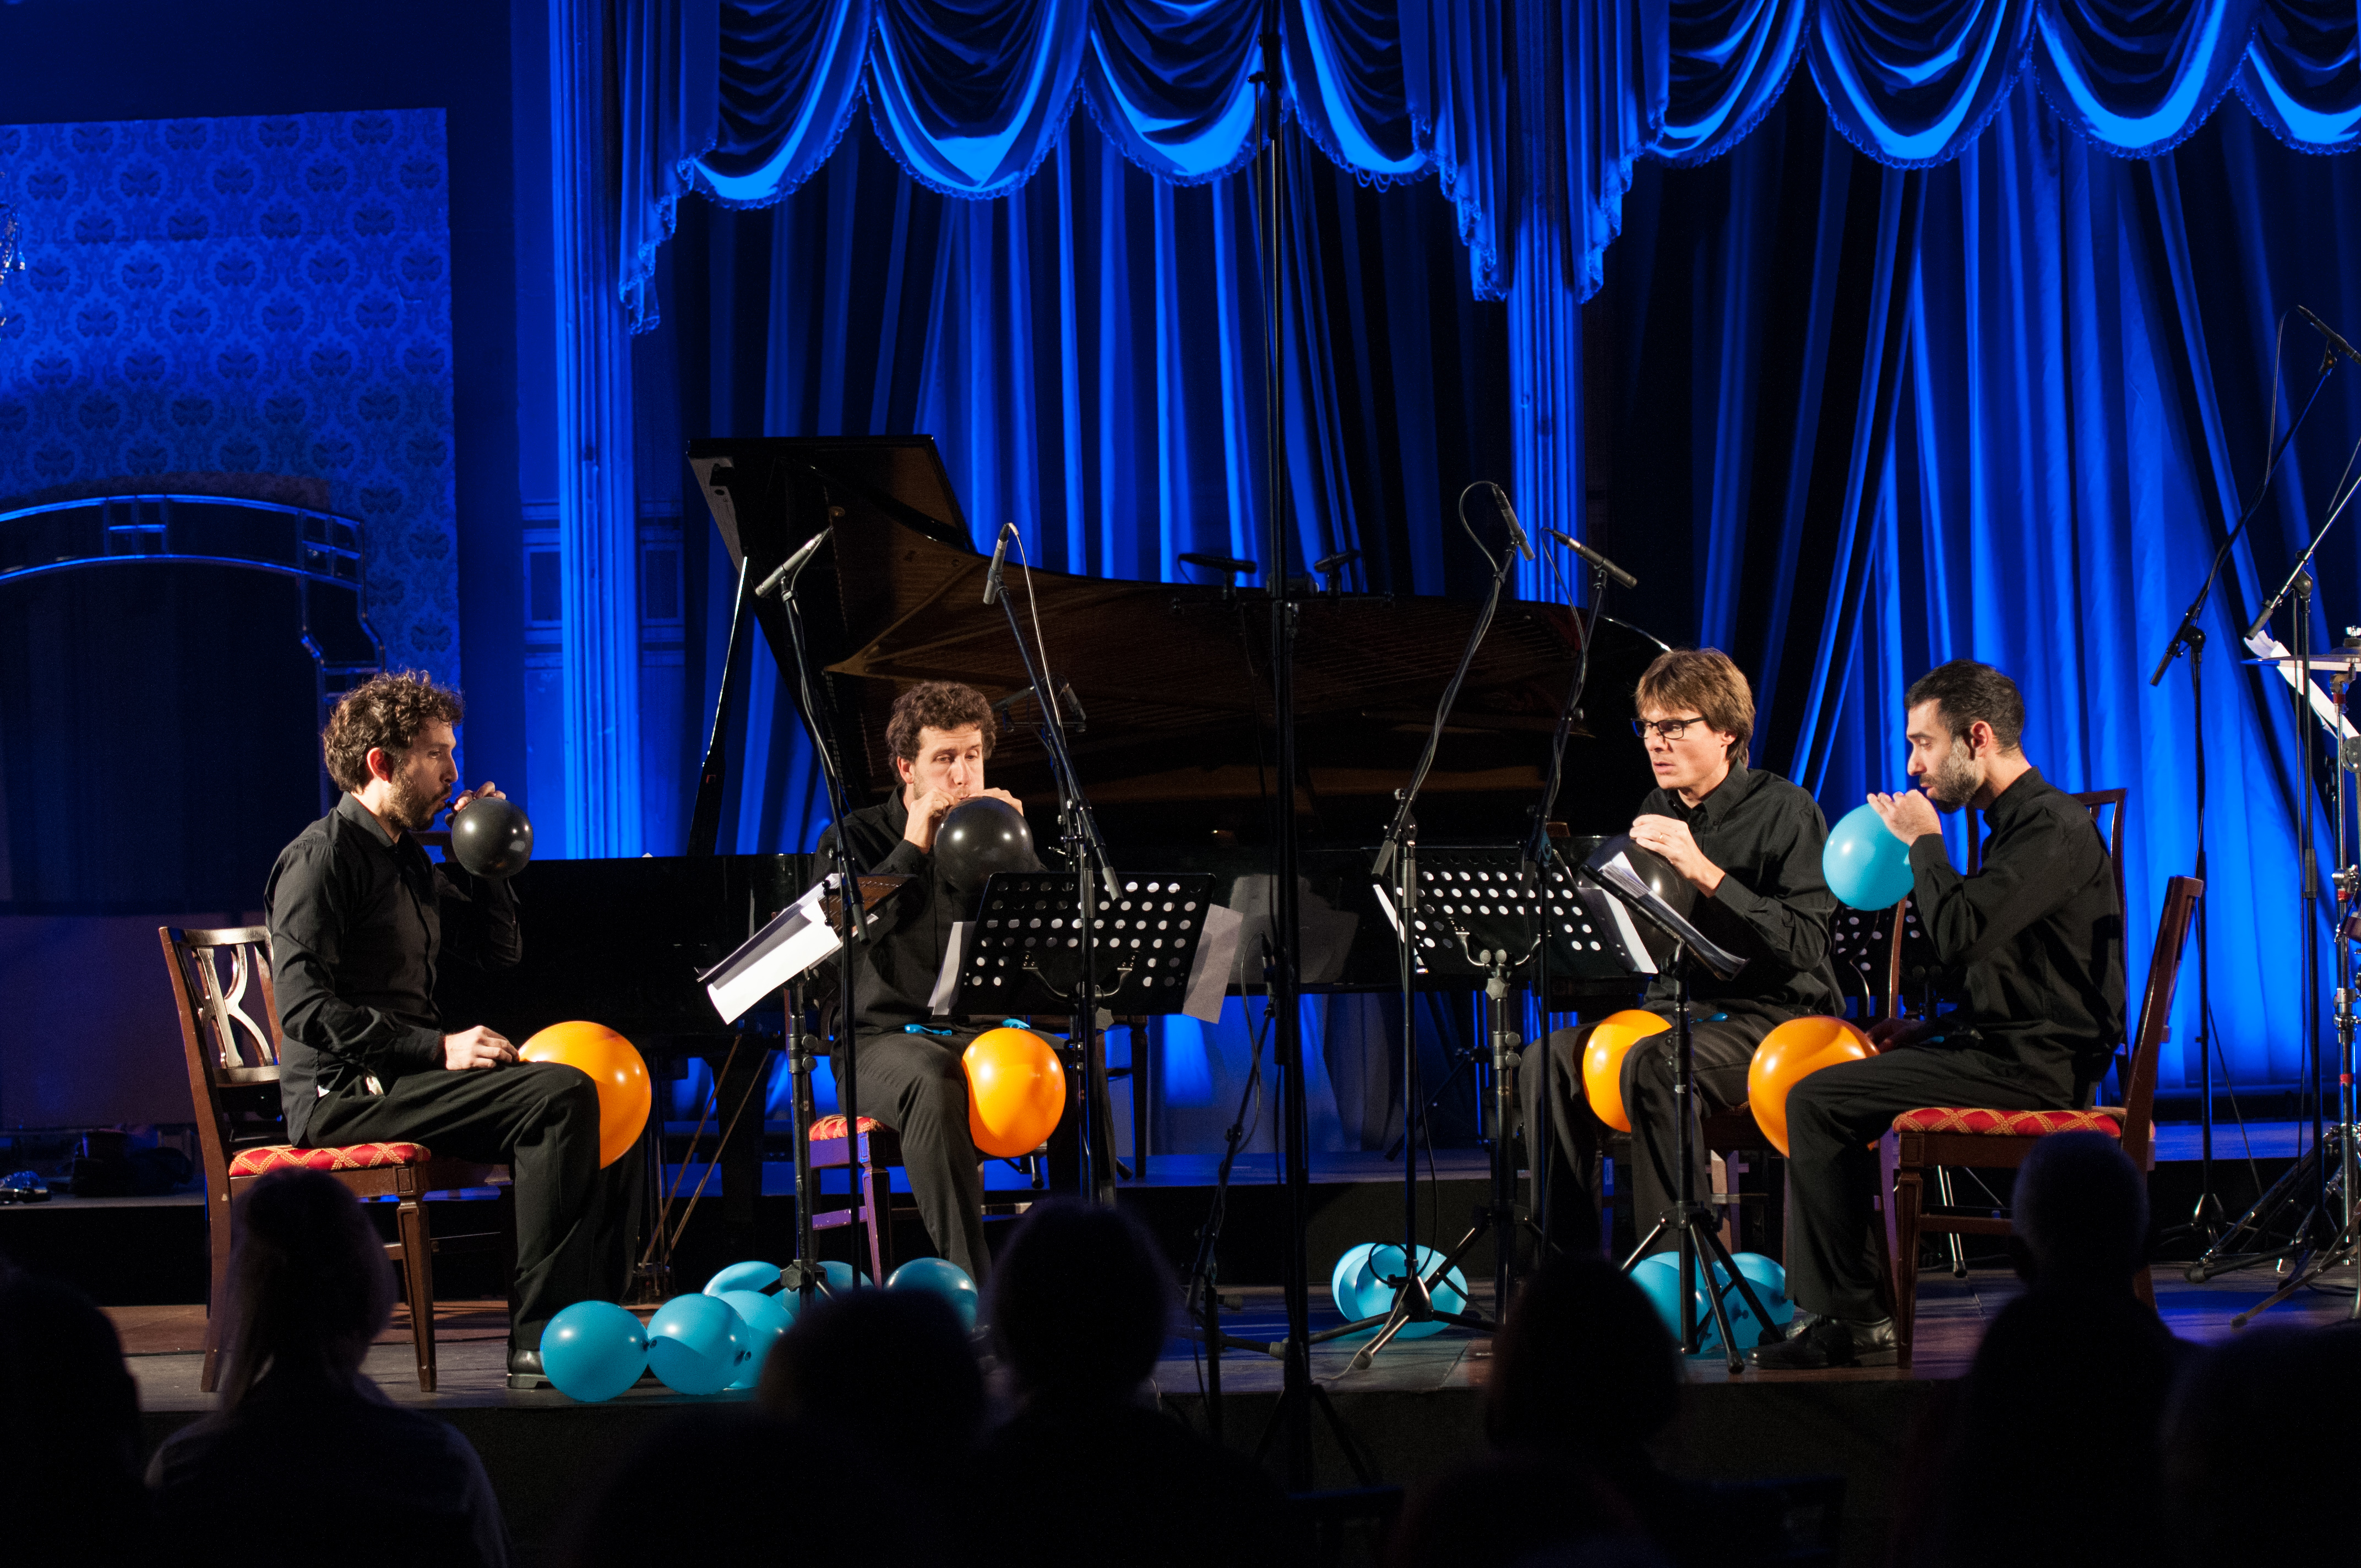 Foto Luigi Opatija, Glazbena tribina Opatija 2016 (53), Koncert Ansambl mdi